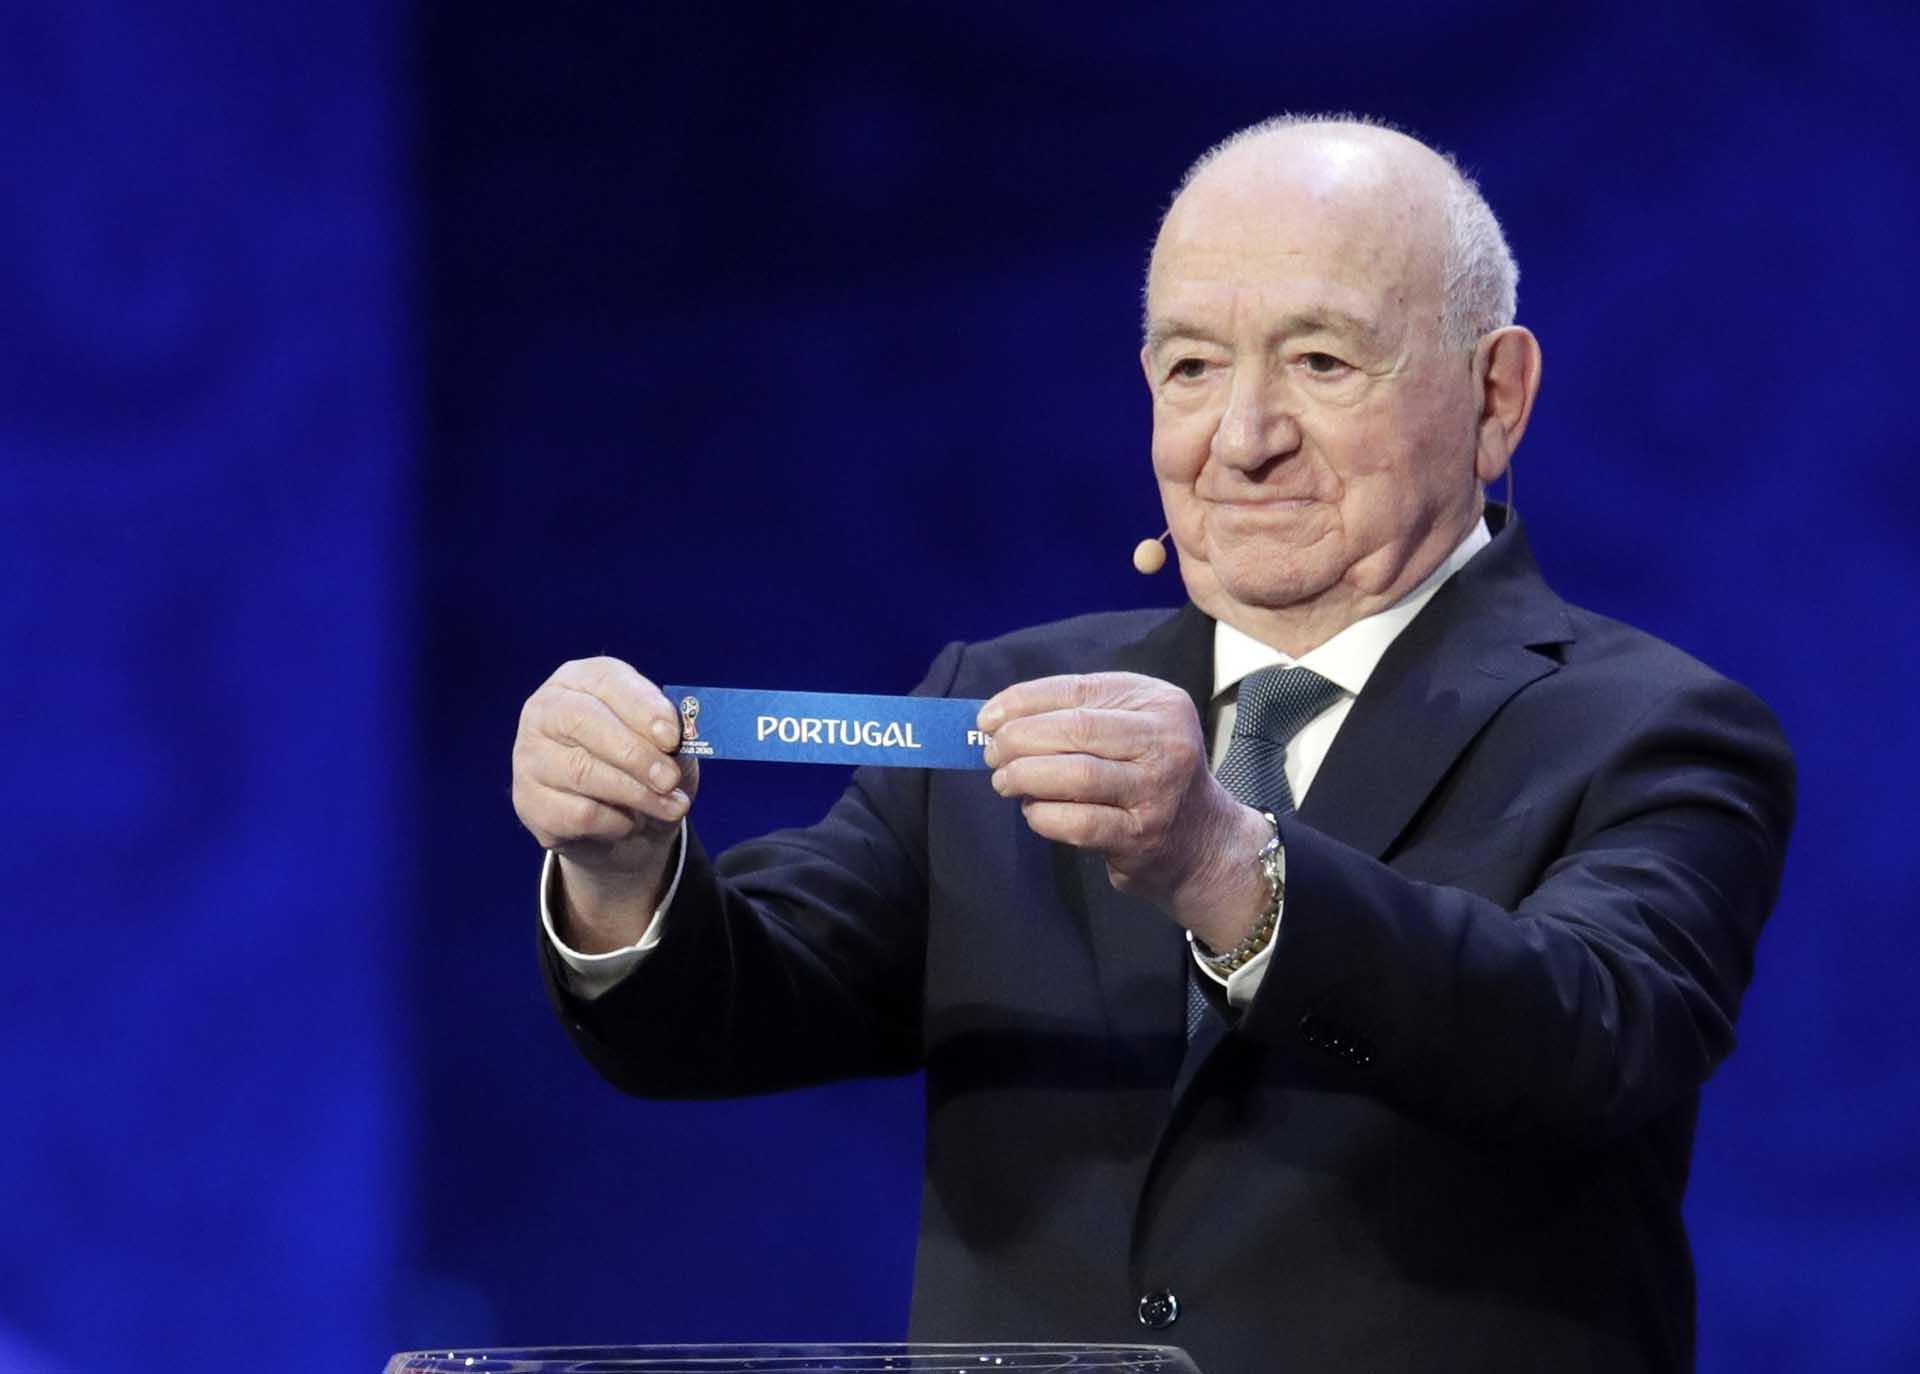 Nikita Simonyan, ex jugador ruso,muestra que Portugal va al grupo B(AP Photo/Dmitri Lovetsky)